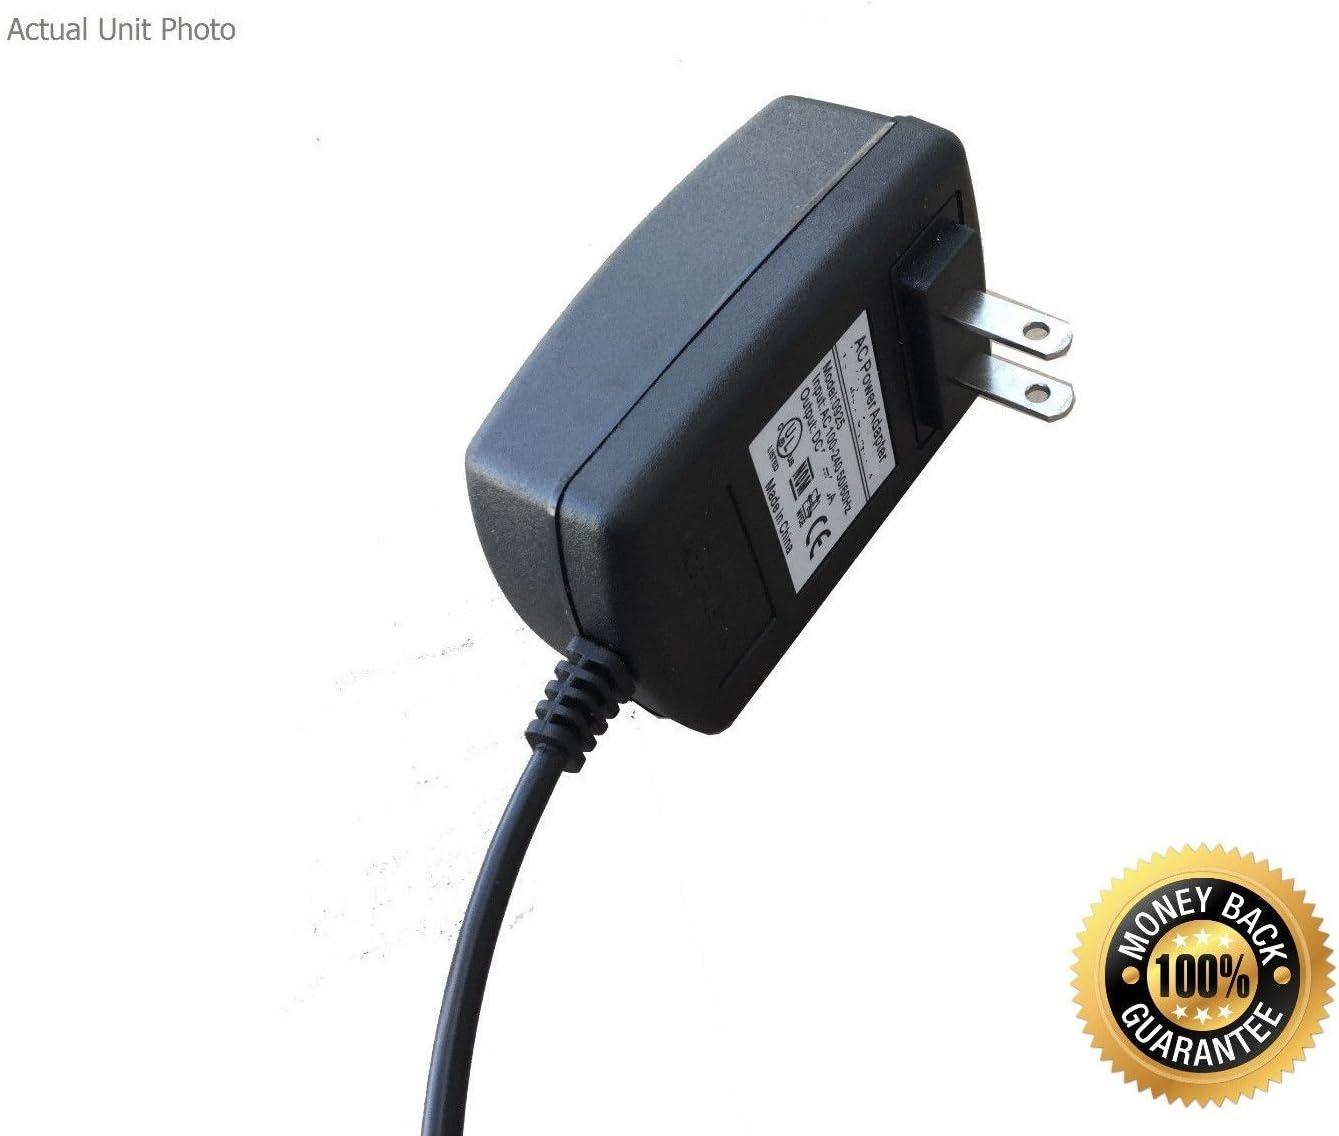 CSE3.6 EP133B Year 2007 AC Adapter Power Supply for Horizon Fitness Elliptical Club Series